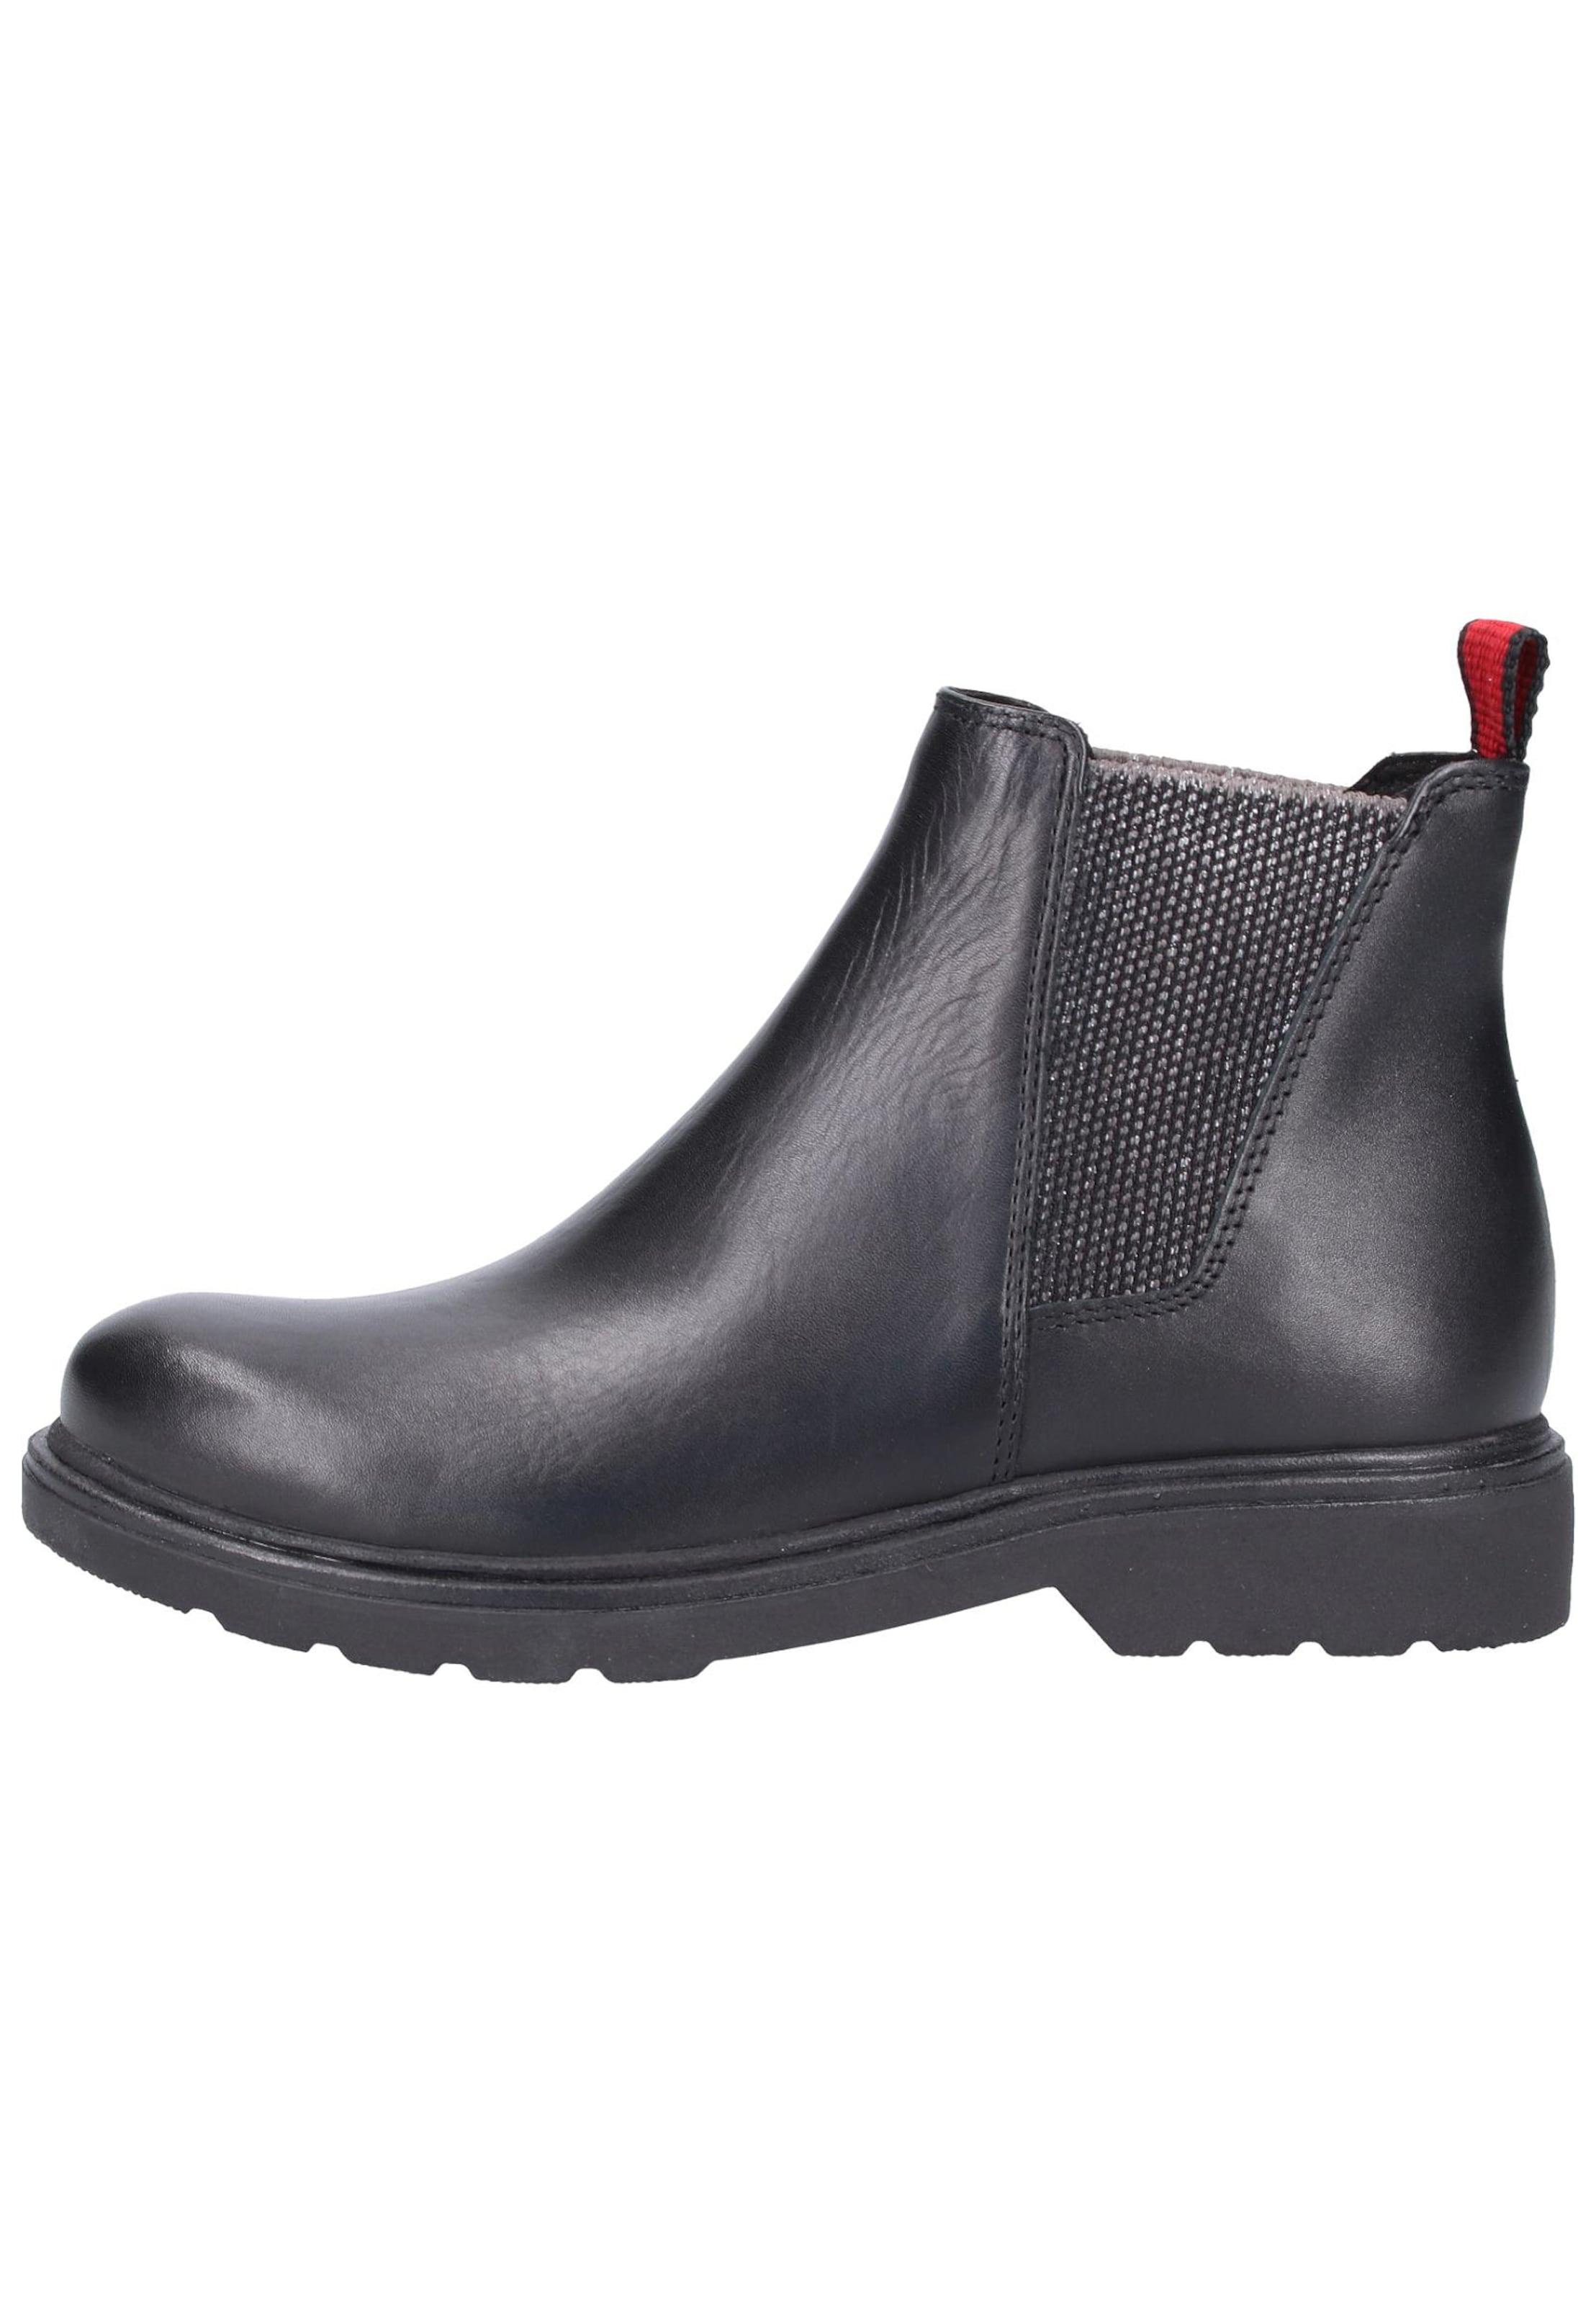 Marco Chelsea RougeNoir En Boots Tozzi cKFTl1J